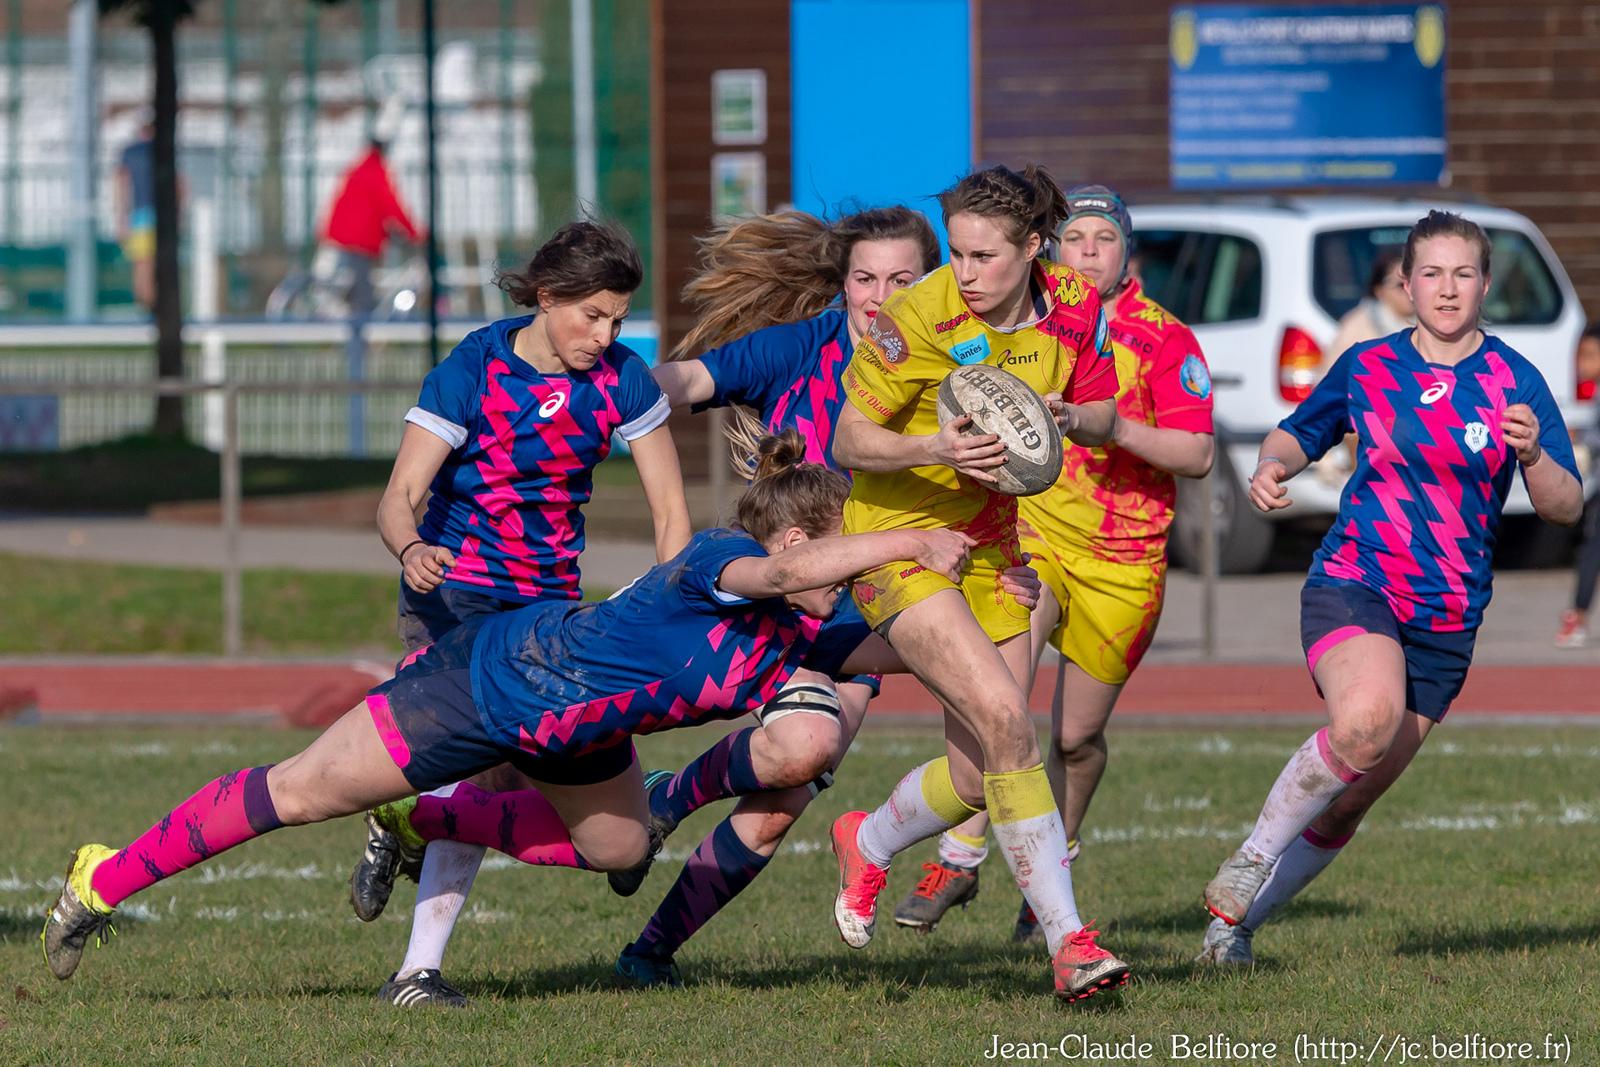 ANRF-conférence-boom-rugby-féminin-sevent